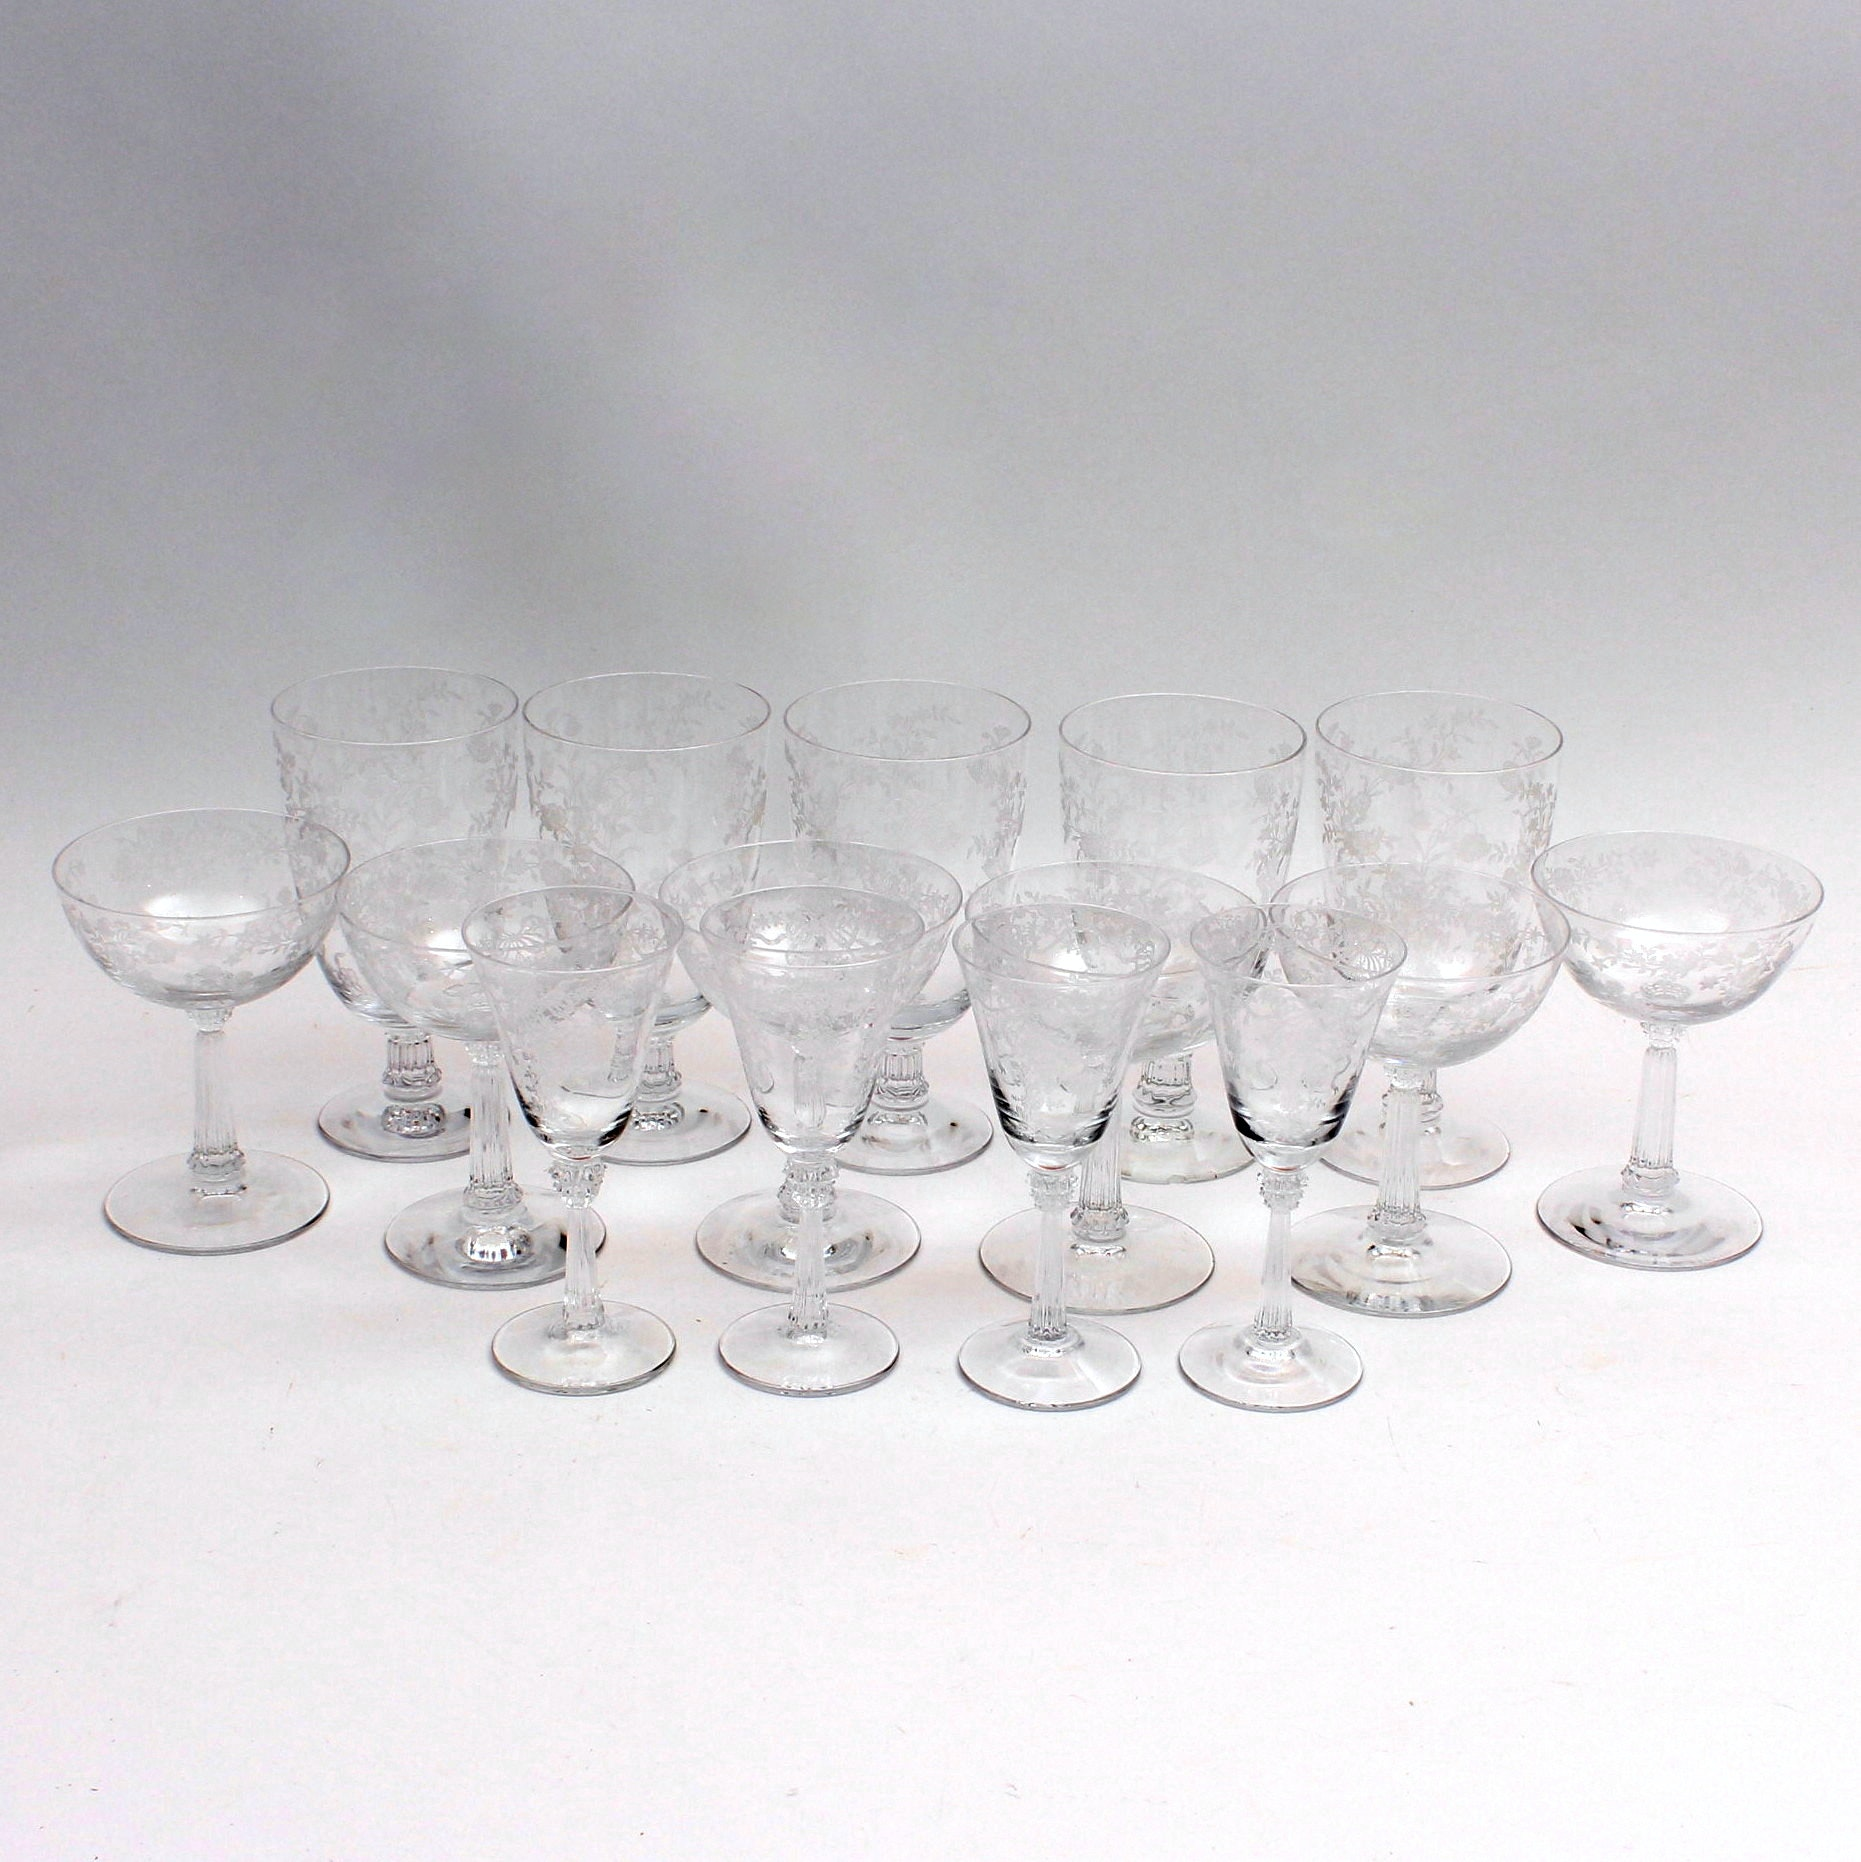 Vintage Hand-Etched Glassware